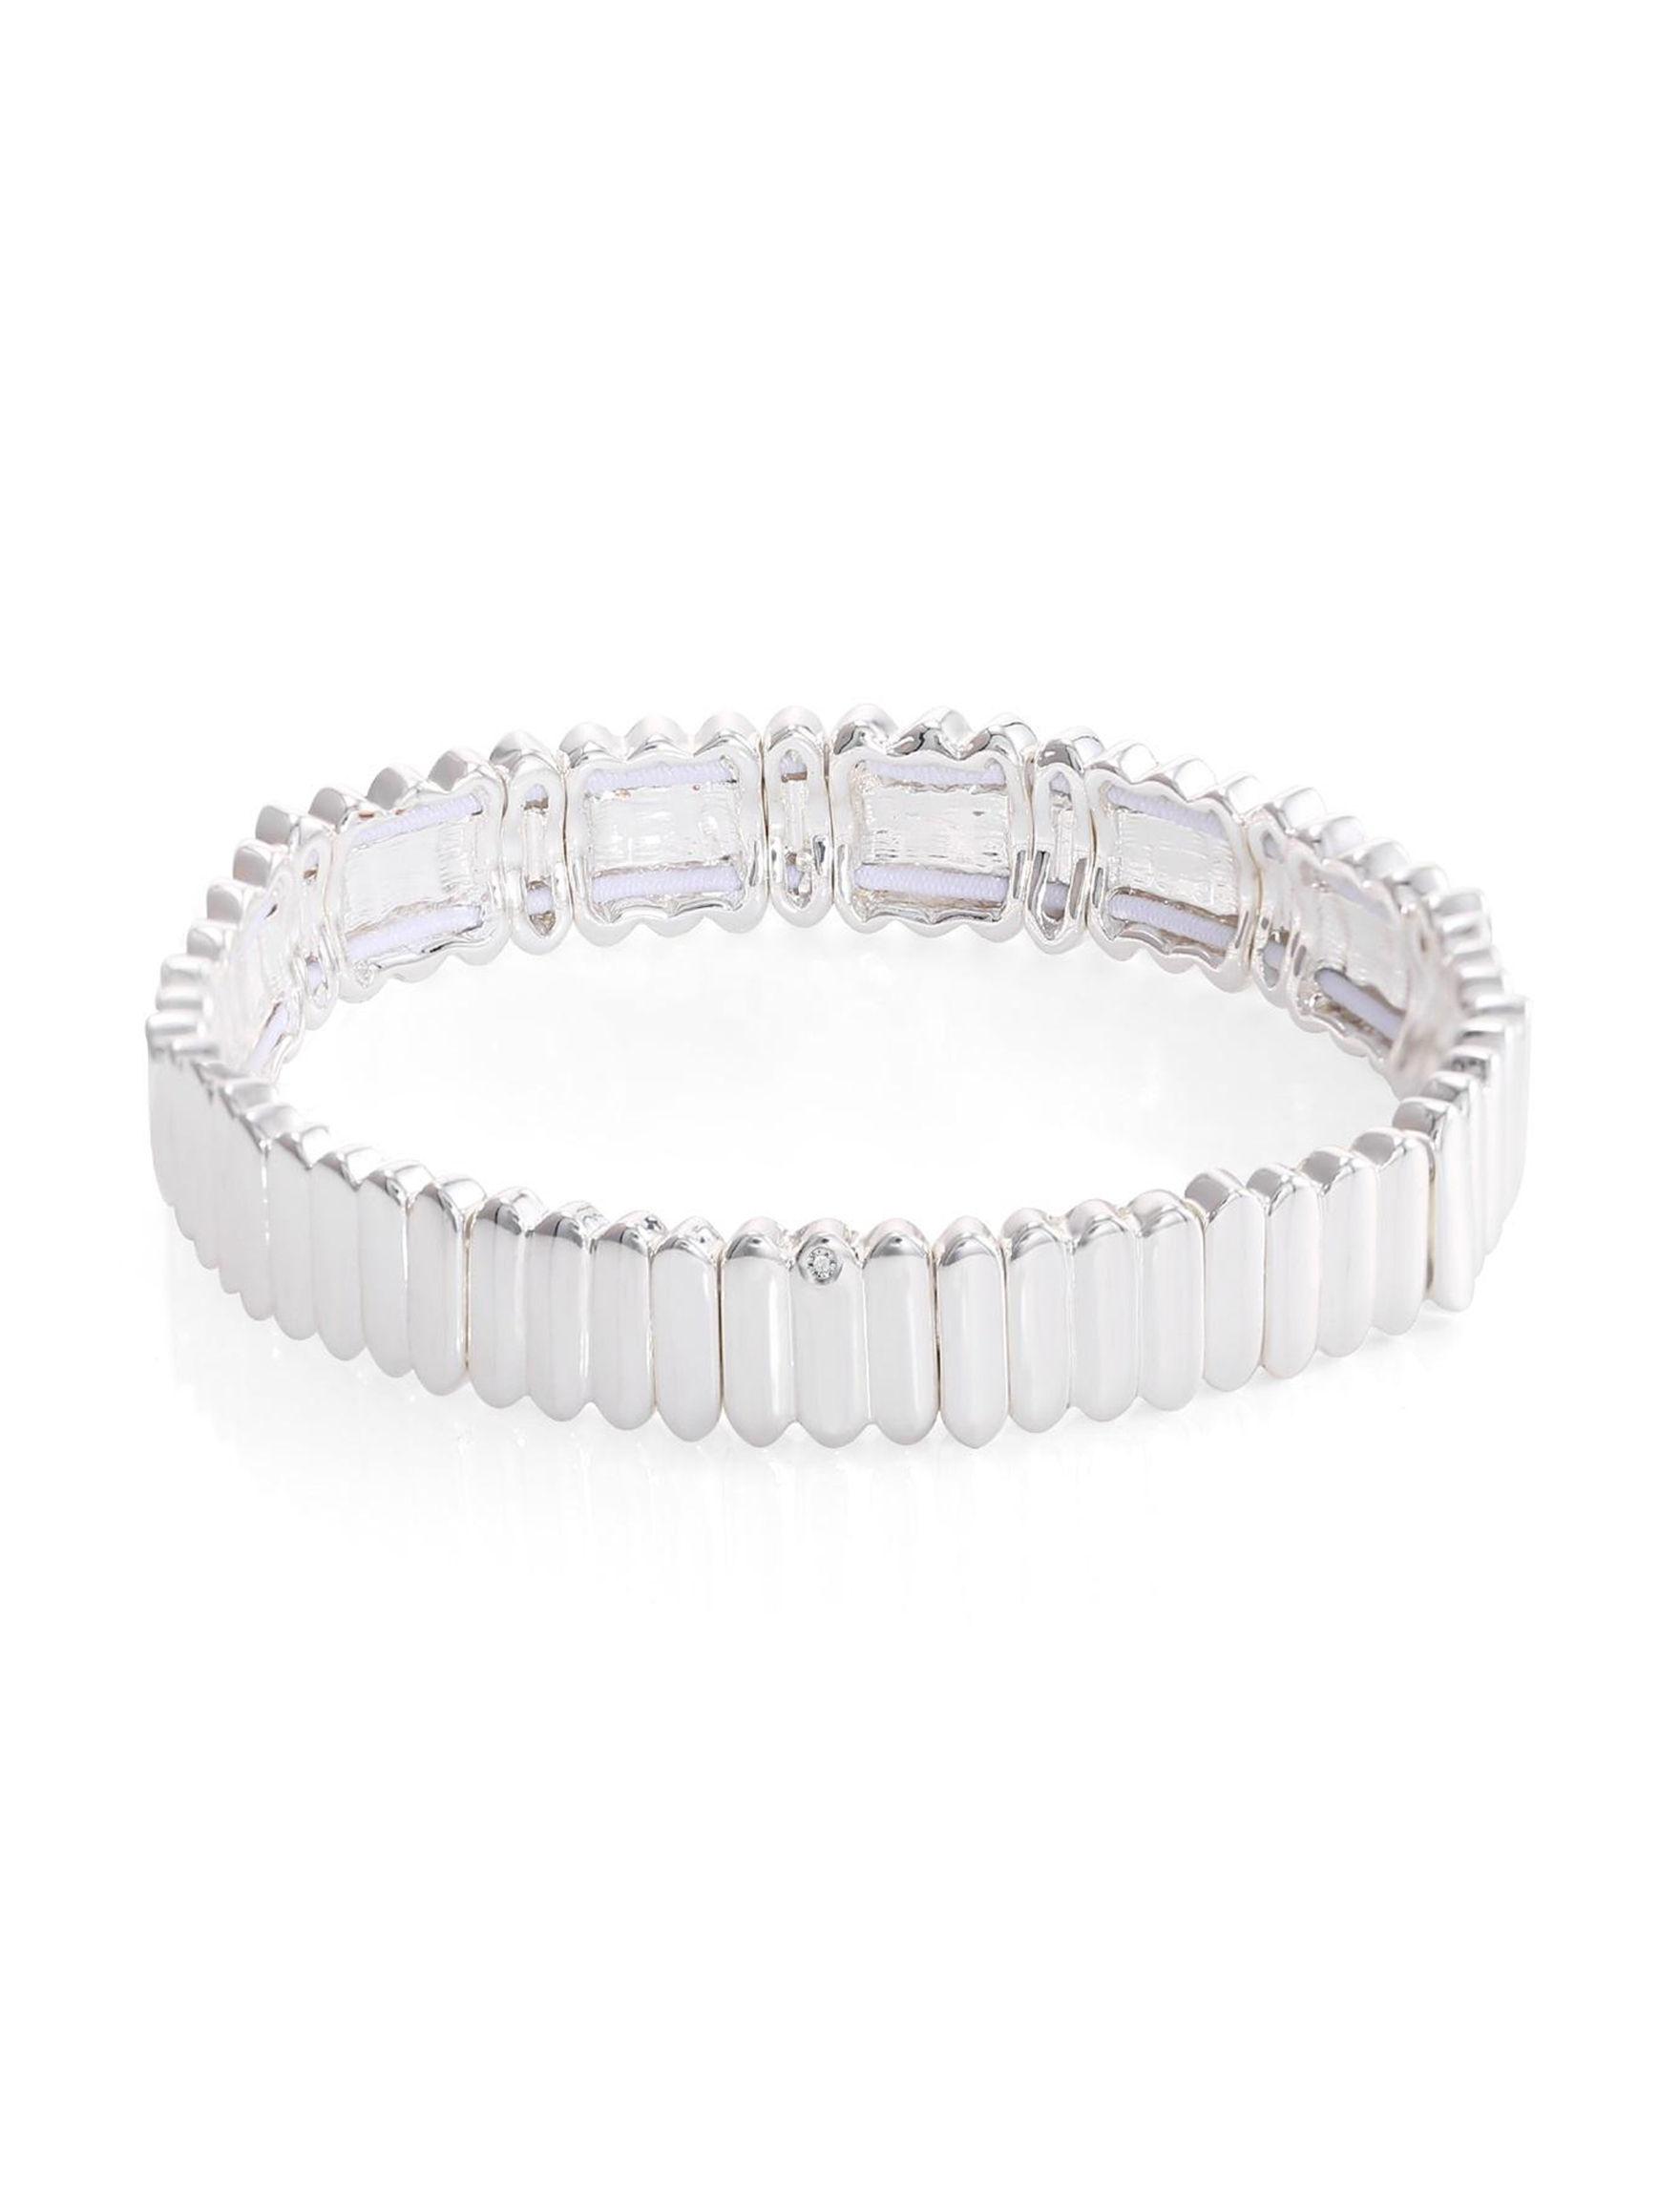 Chaps Silver Bracelets Fashion Jewelry